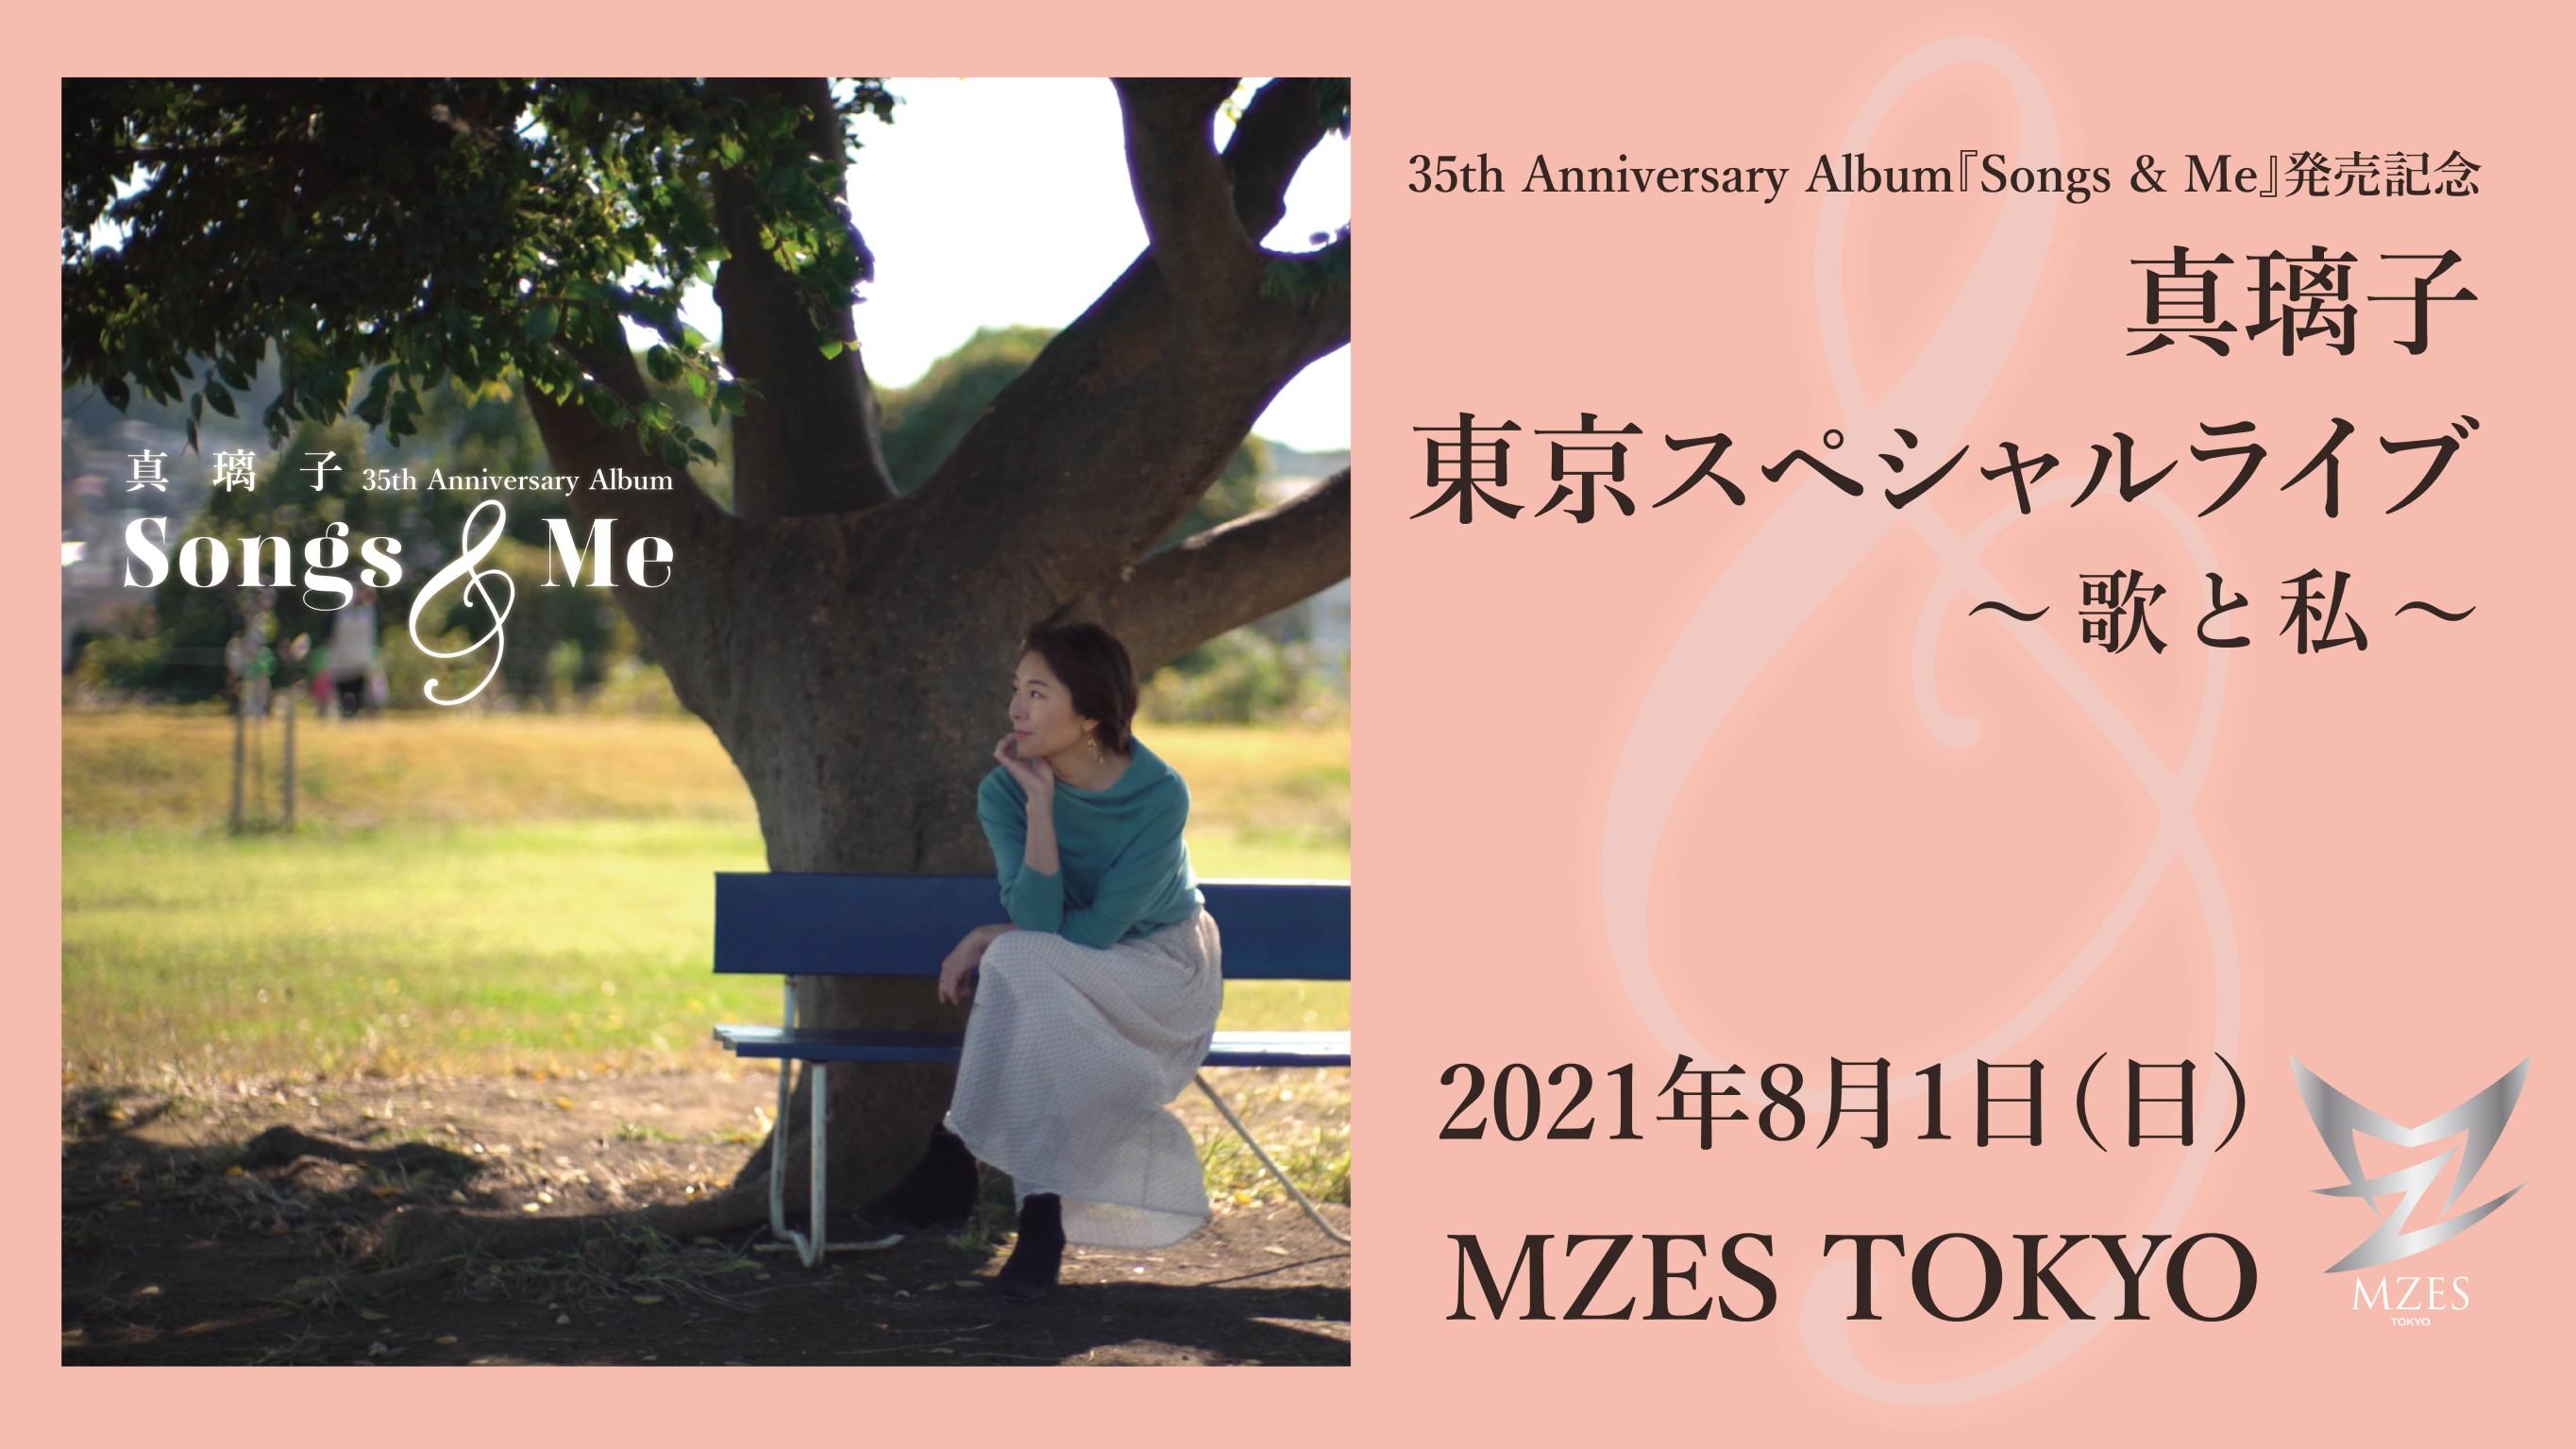 35th Anniversary Album 『Songs & Me』 発売記念 真璃子 東京スペシャルライブ ~歌と私~